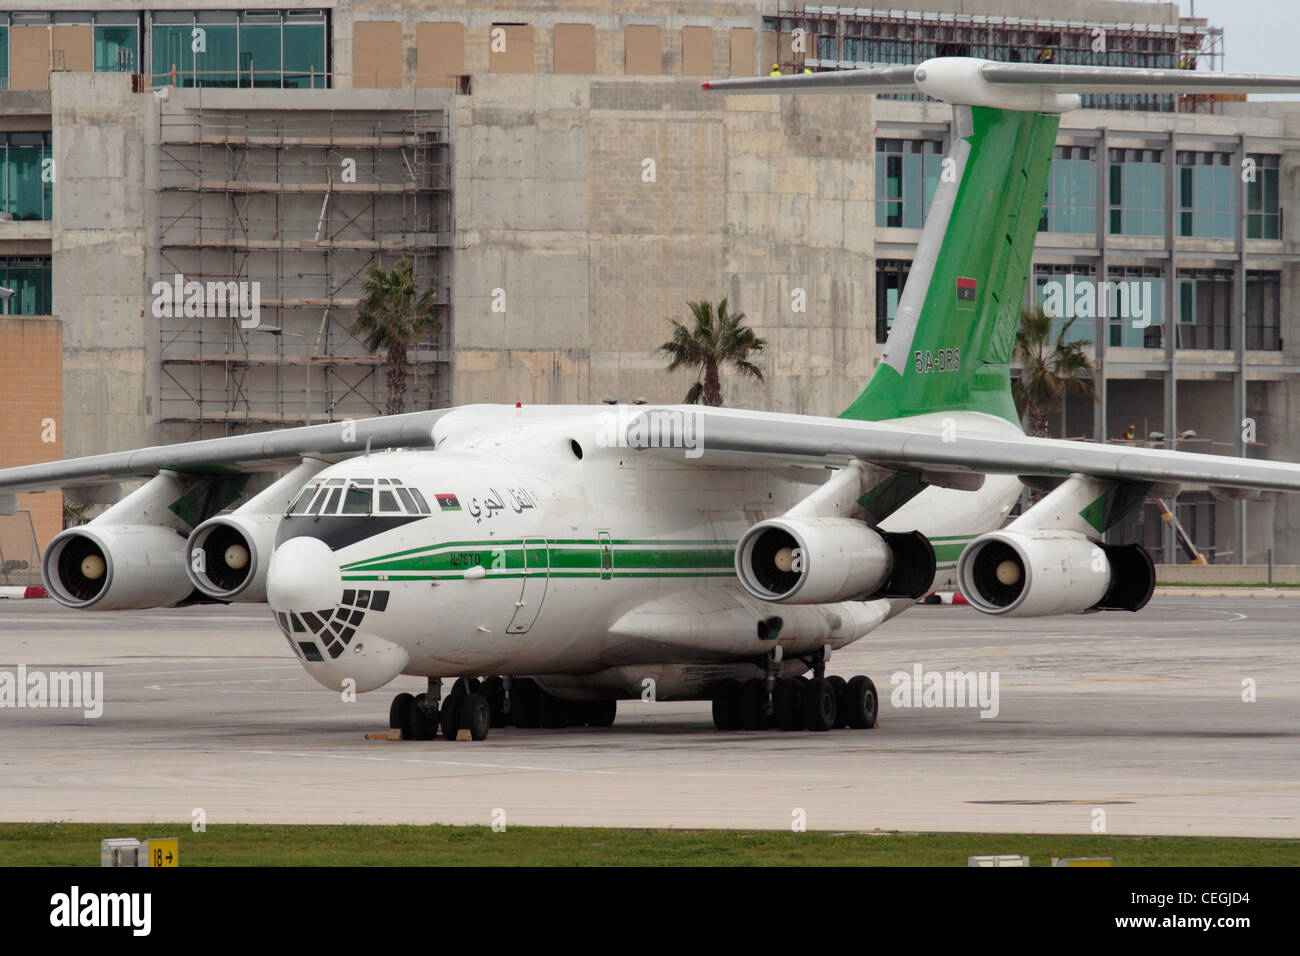 Libyan Air Cargo Ilyushin Il-76TD bearing the country's post-revolution flag - Stock Image